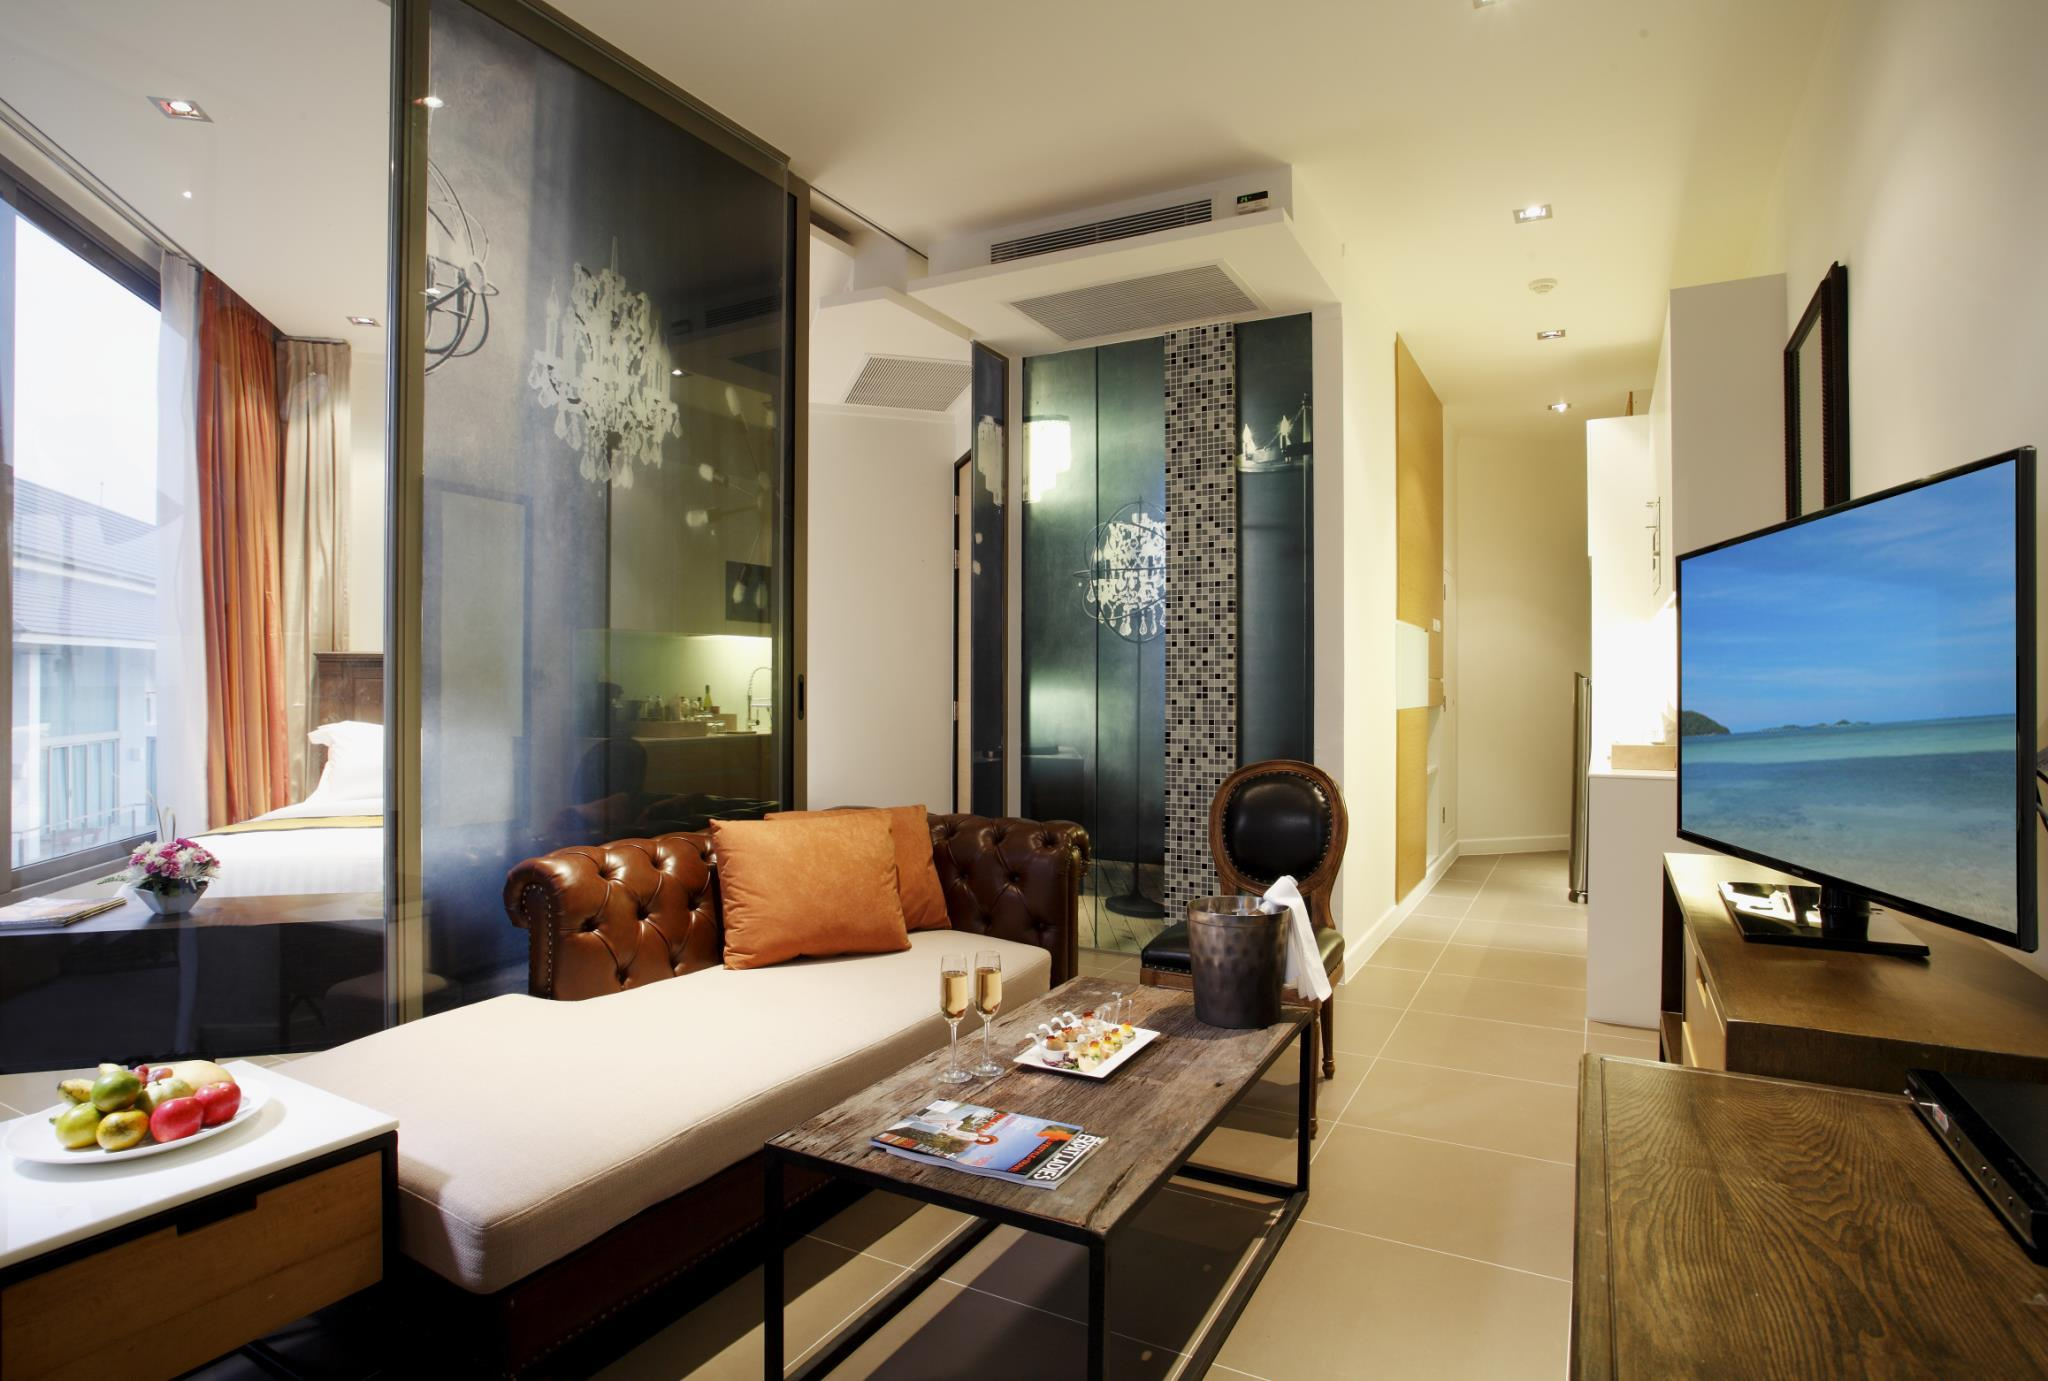 Modus Suites & Serviced Residence,โมดัส สวีท แอนด์ เซอร์วิซ เรสซิเดนซ์